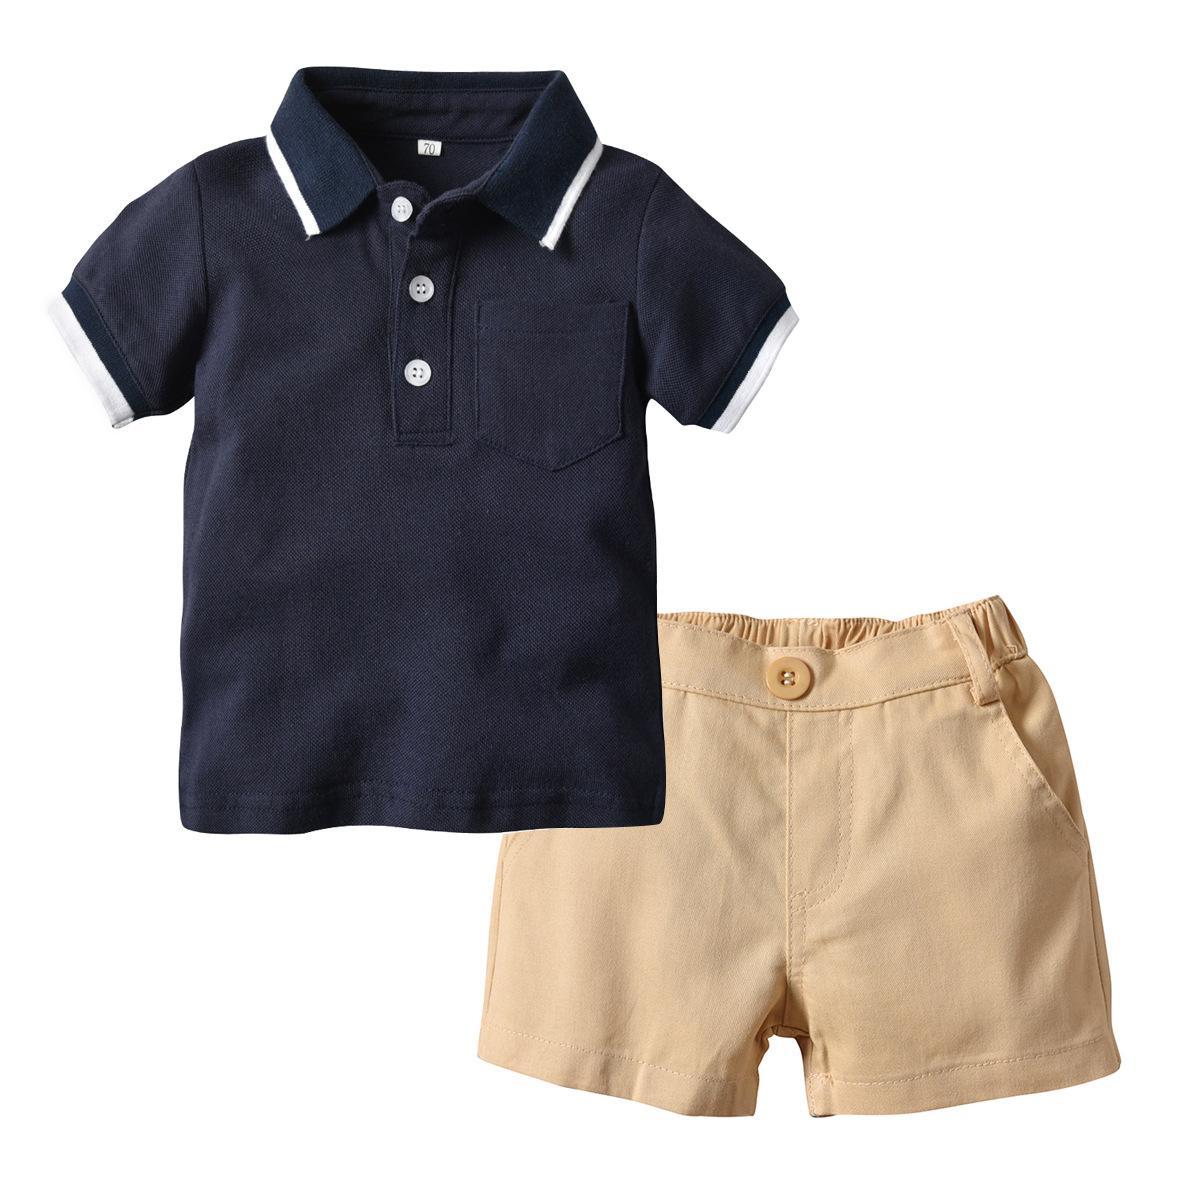 77bcf7a4c Boys Set New Boy White Turn-down collar Polo Shirt+Solid Color Short Pants  2019 Summer Fashion Infant Boutique Suit Clothing 2 Colors B11